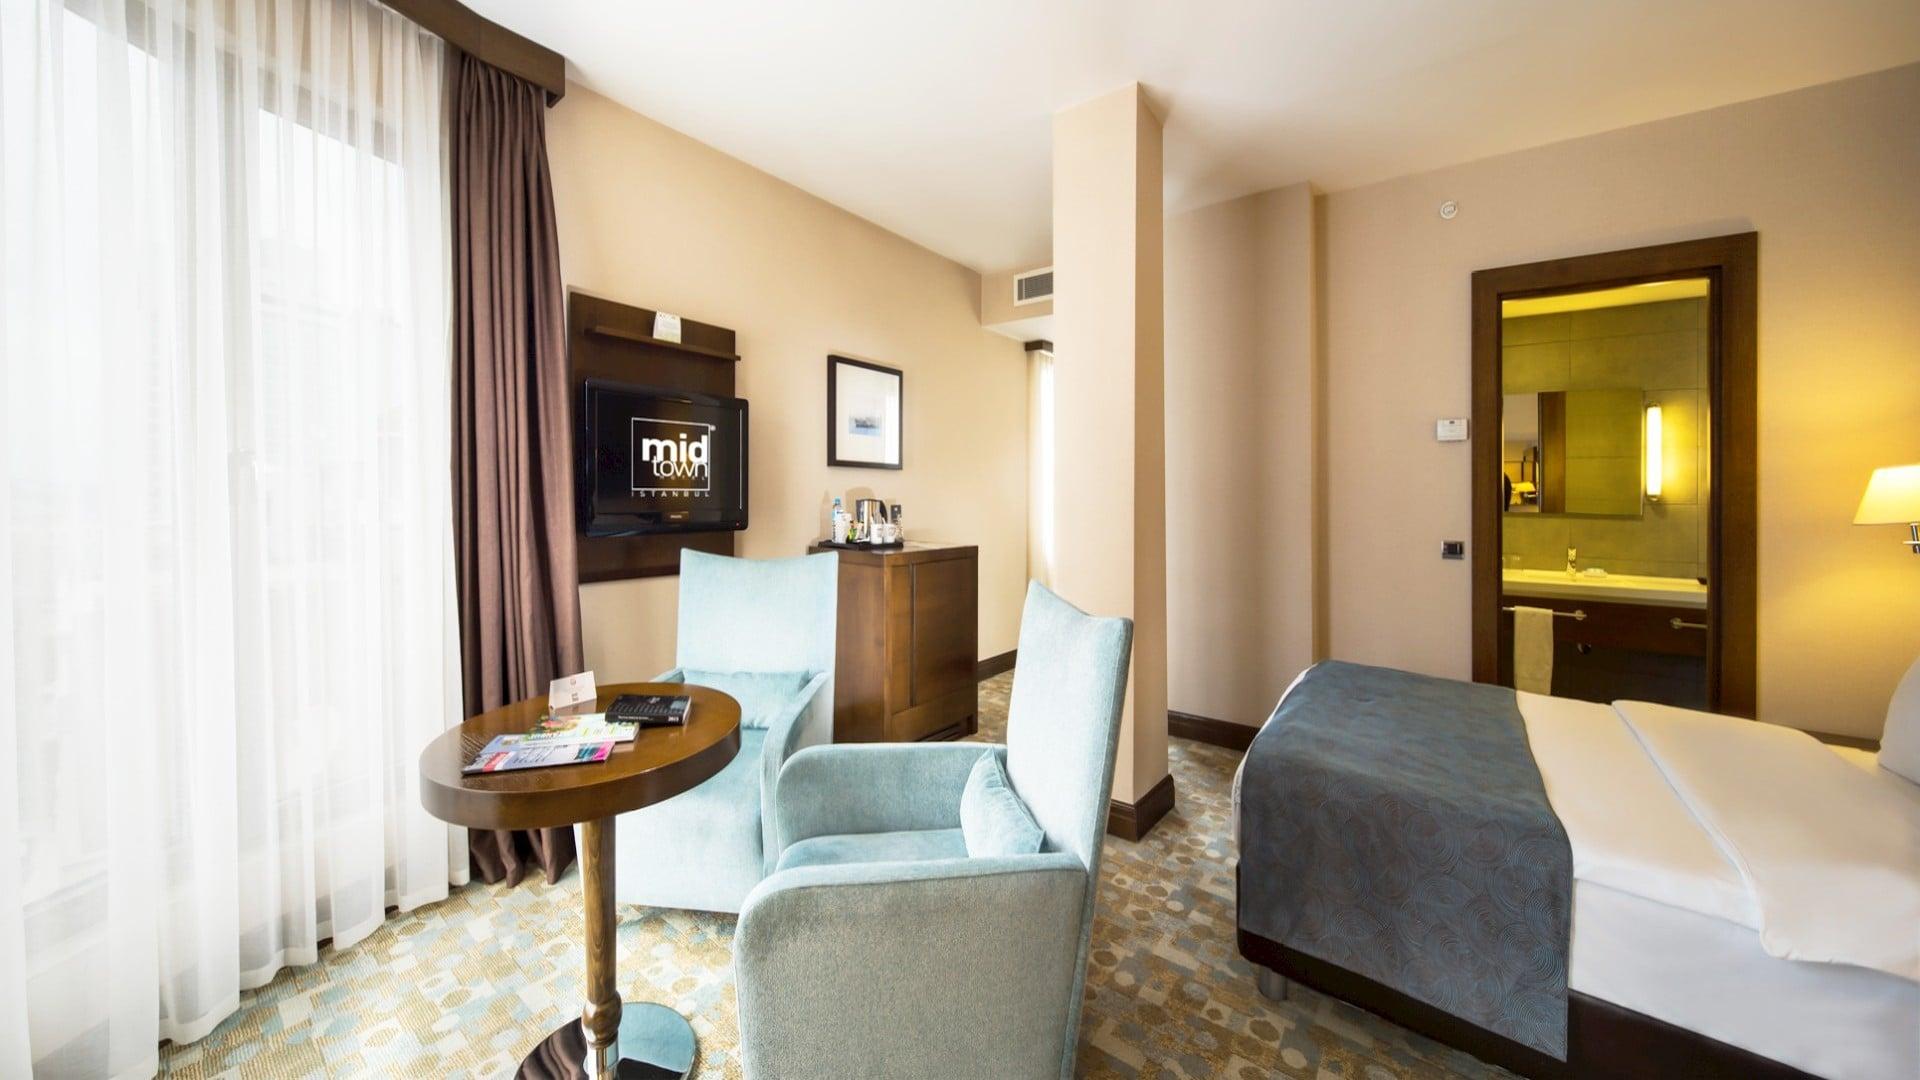 Midtown Hotel Room Interior